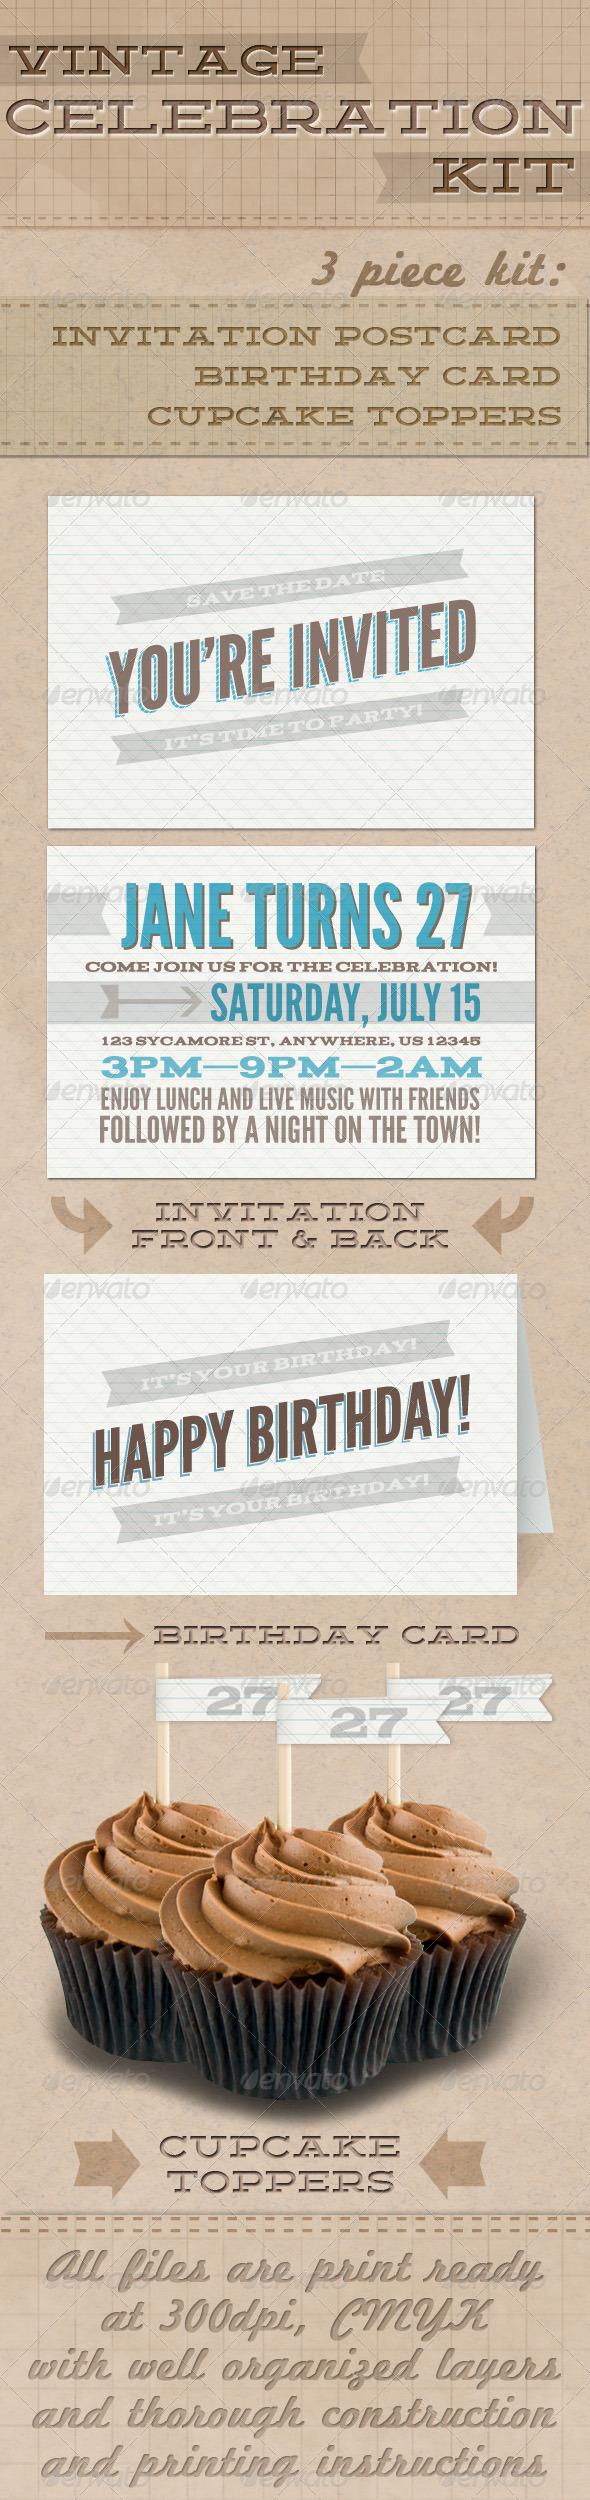 Vintage Celebration Kit - Greeting Cards Cards & Invites